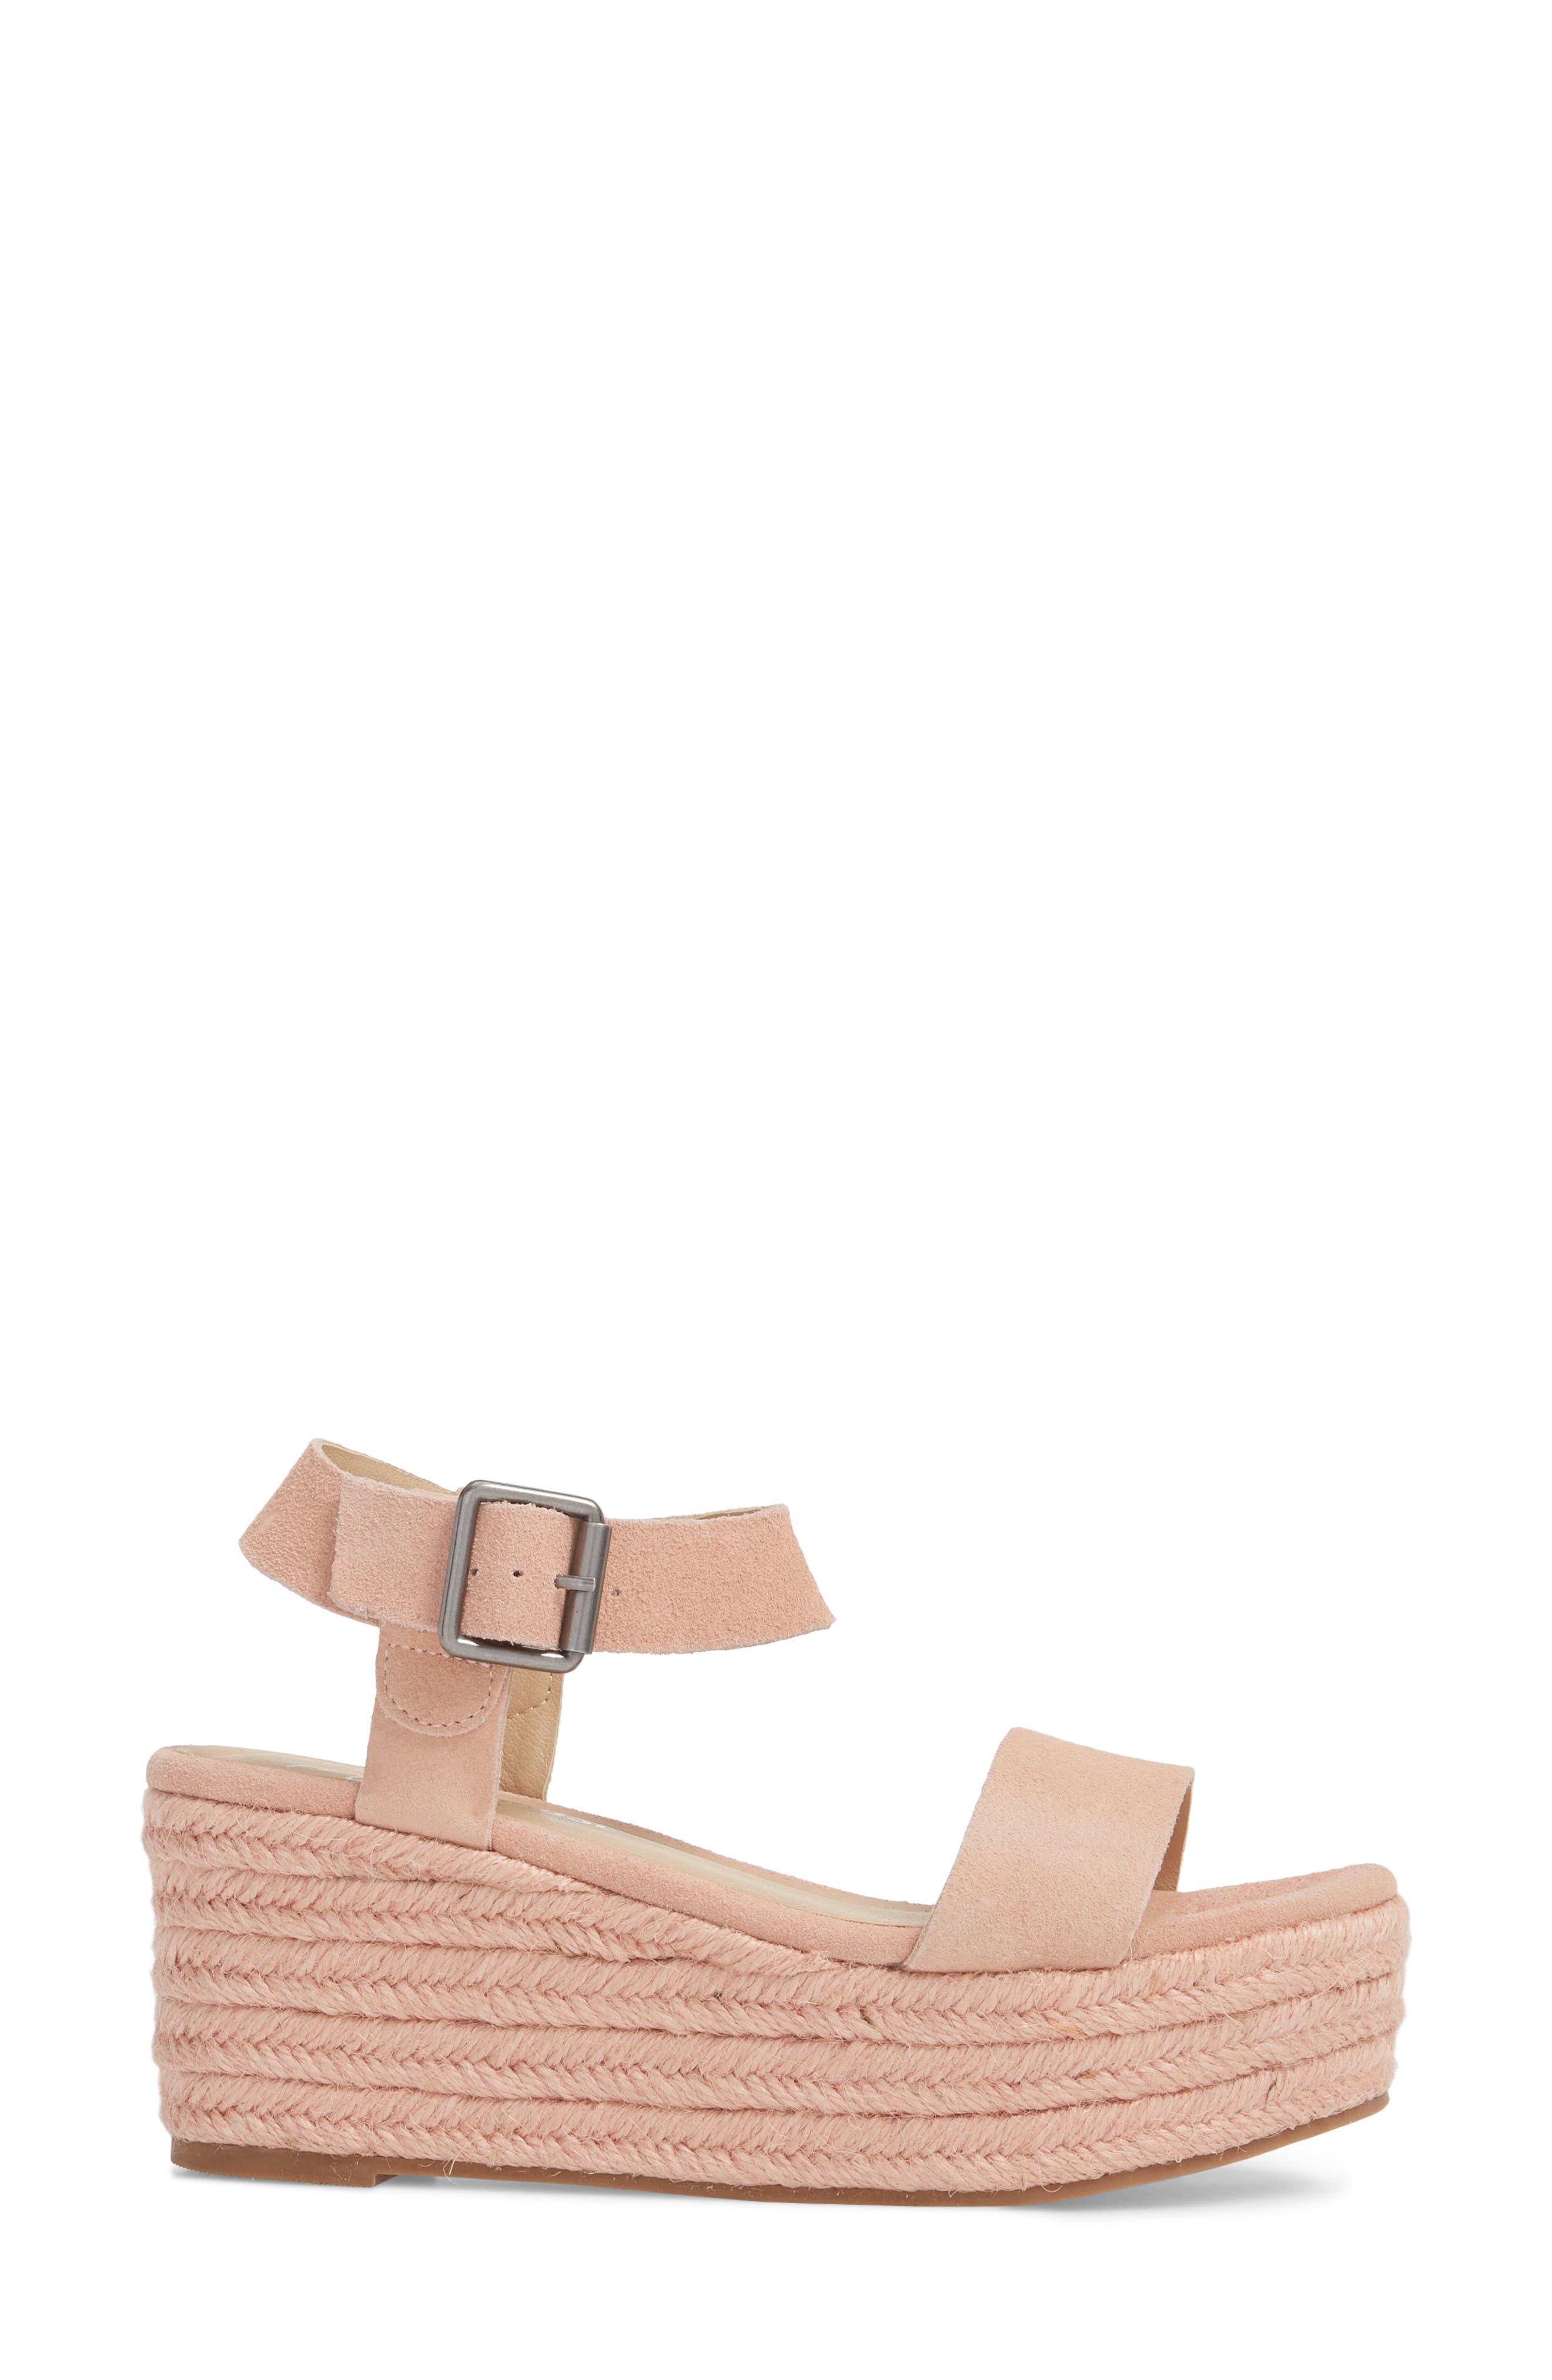 Amuse Society x Matisse Siena Wedge Sandal,                             Alternate thumbnail 9, color,